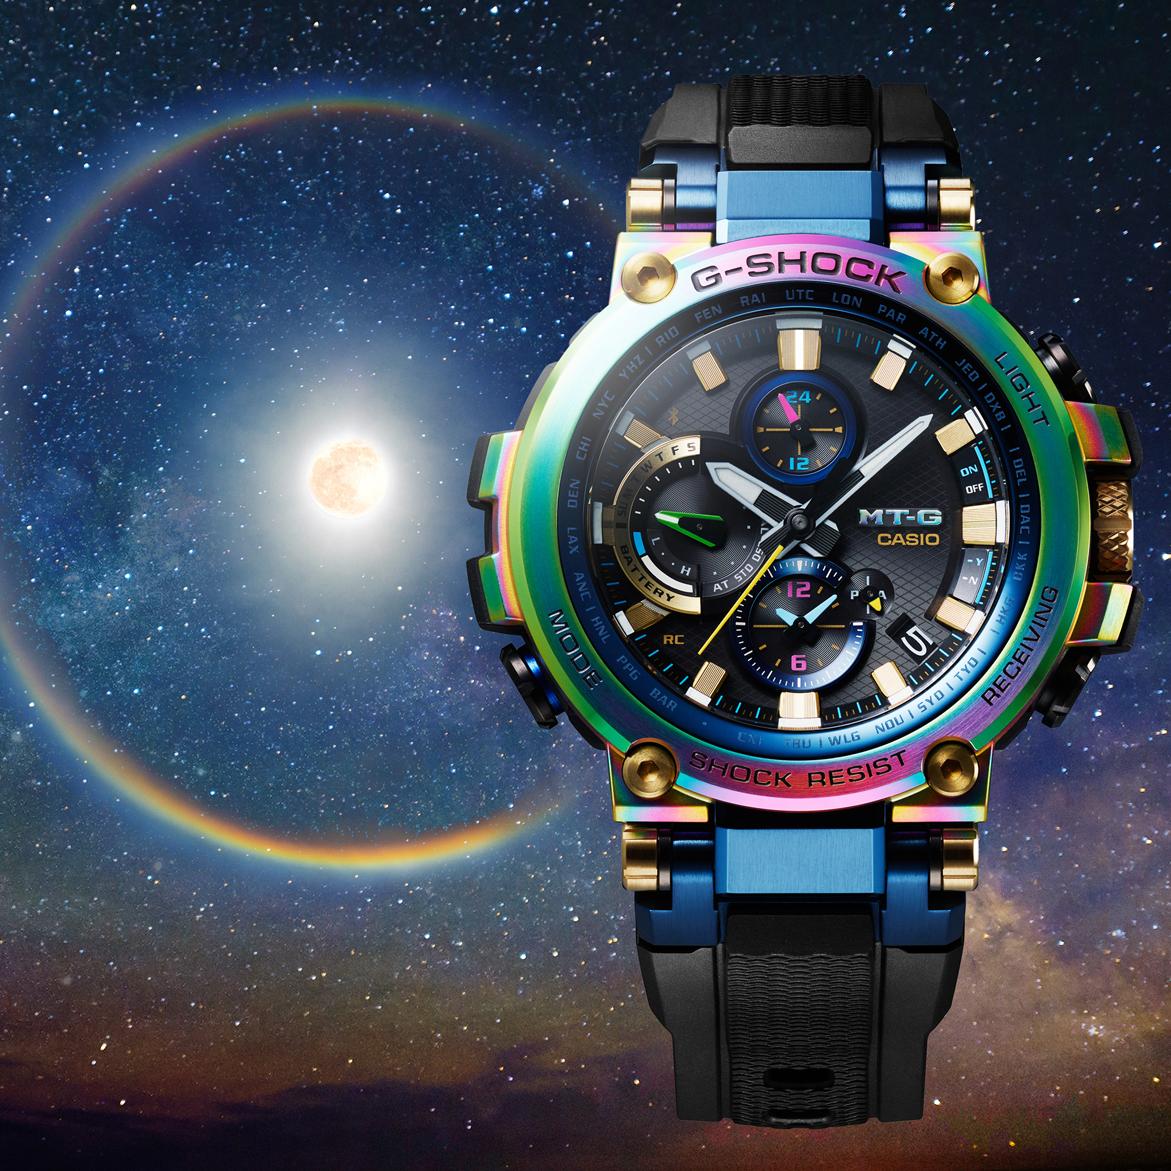 CASIO MT-G 系列 20 週年紀念錶款 MTG-B1000RB